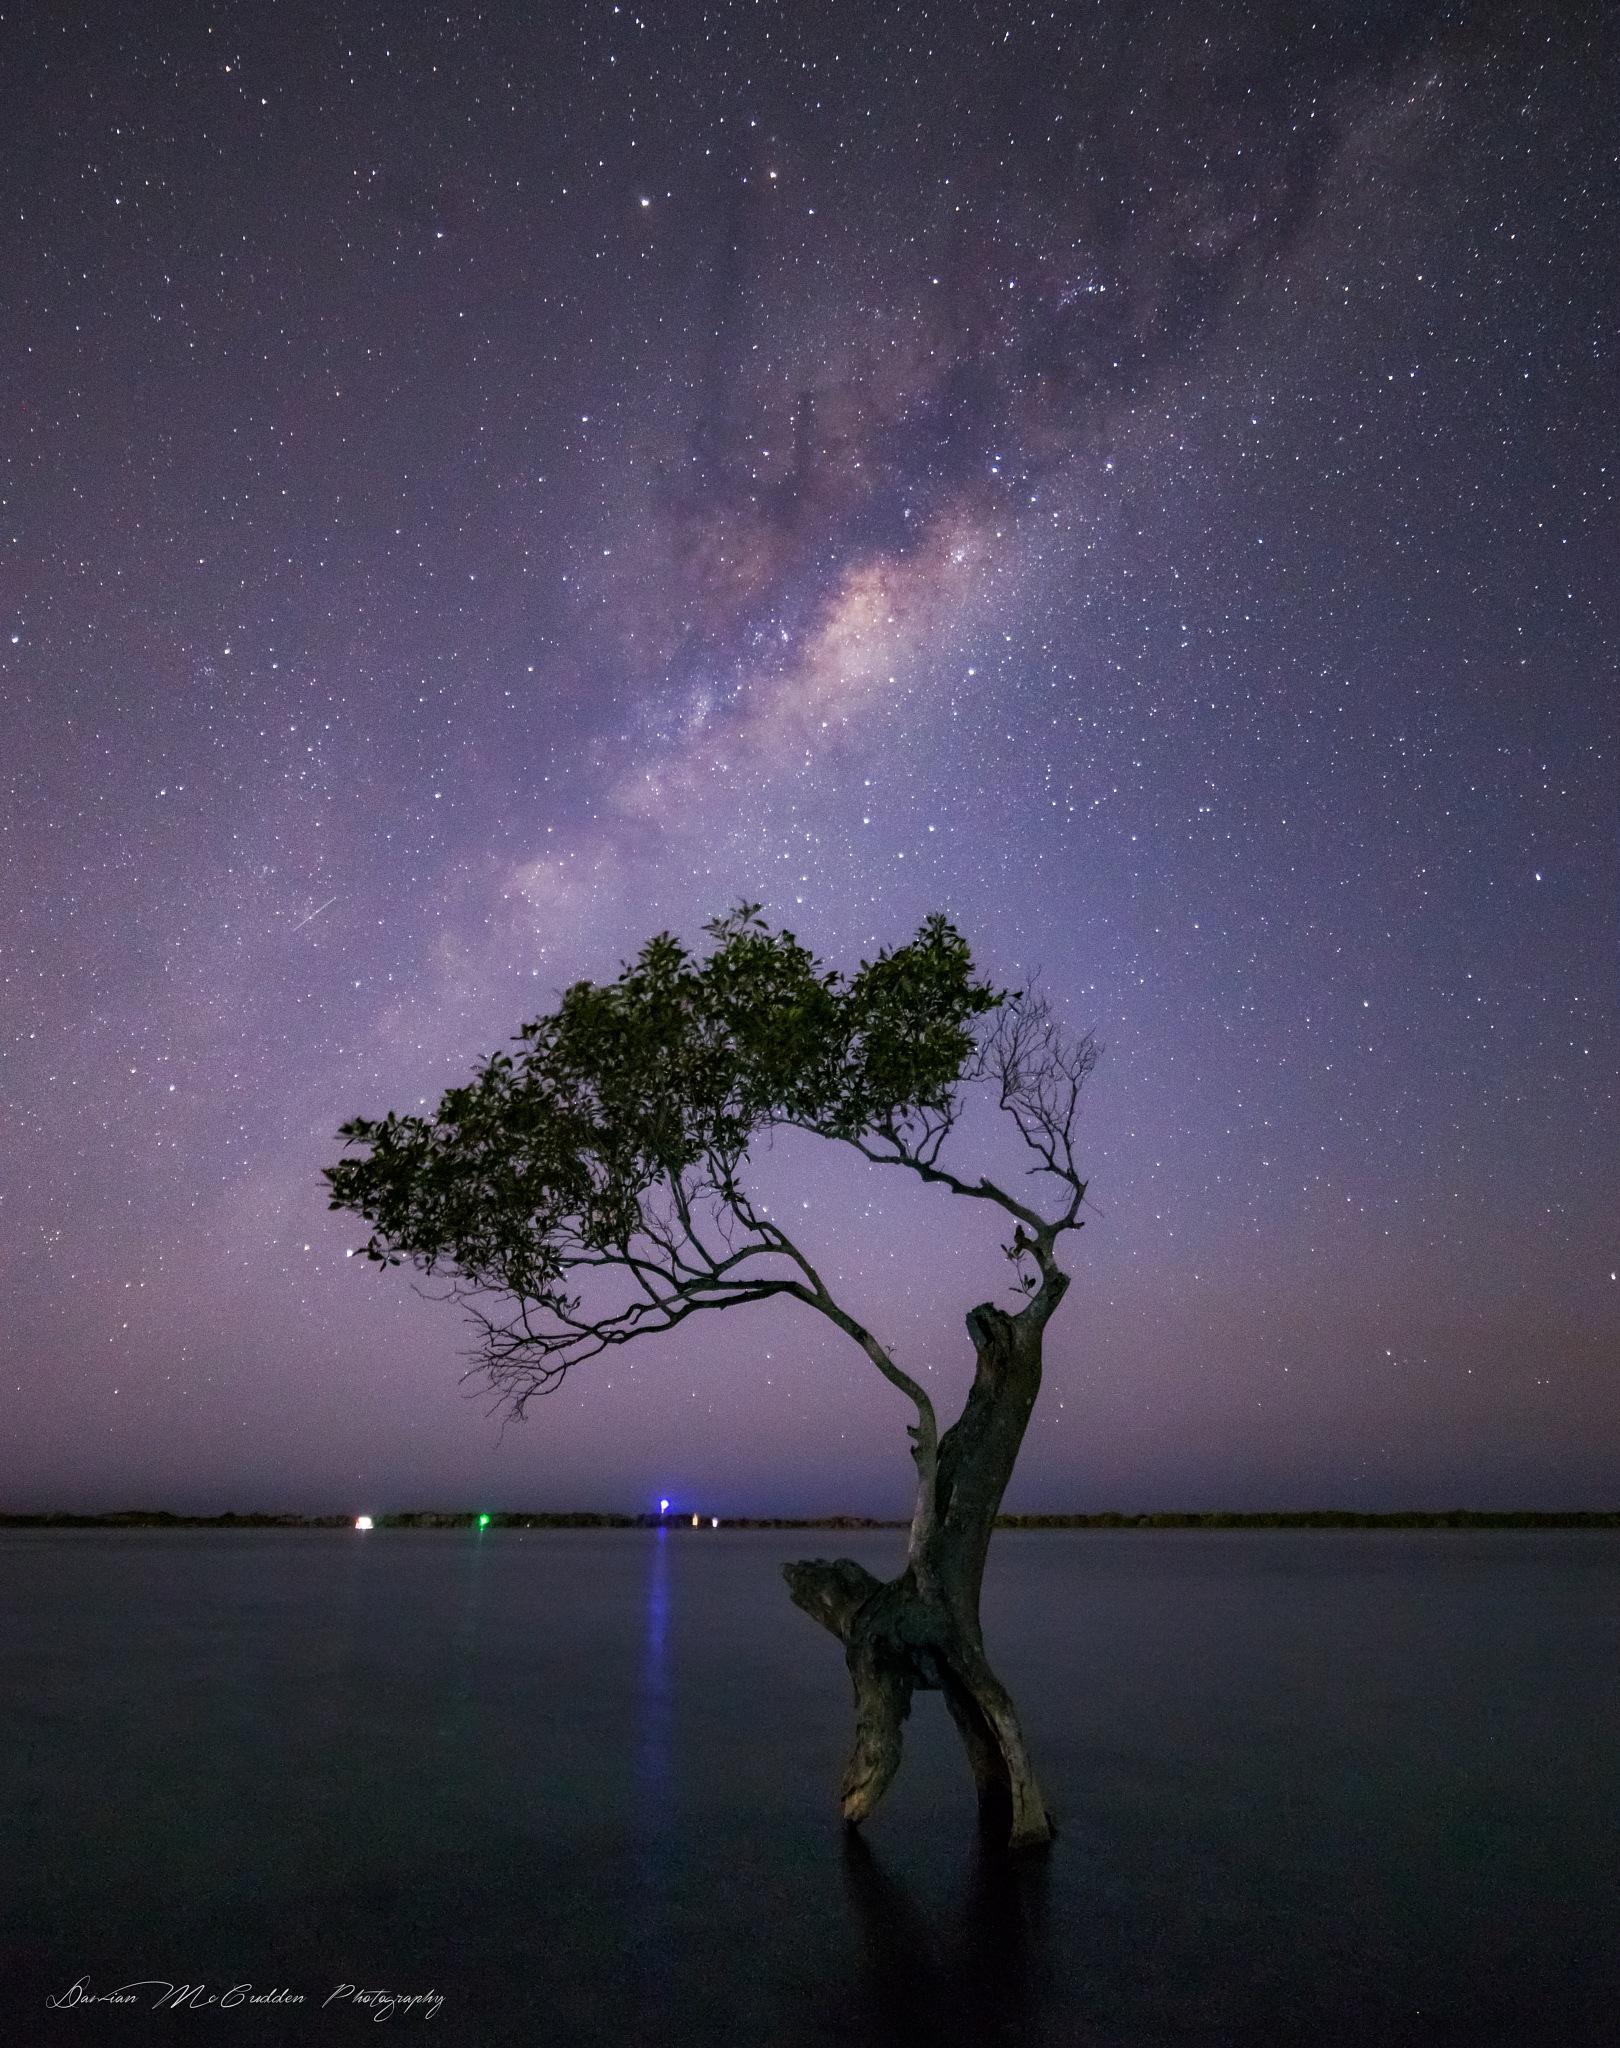 **The Mangrove Tree** by Damian McCudden